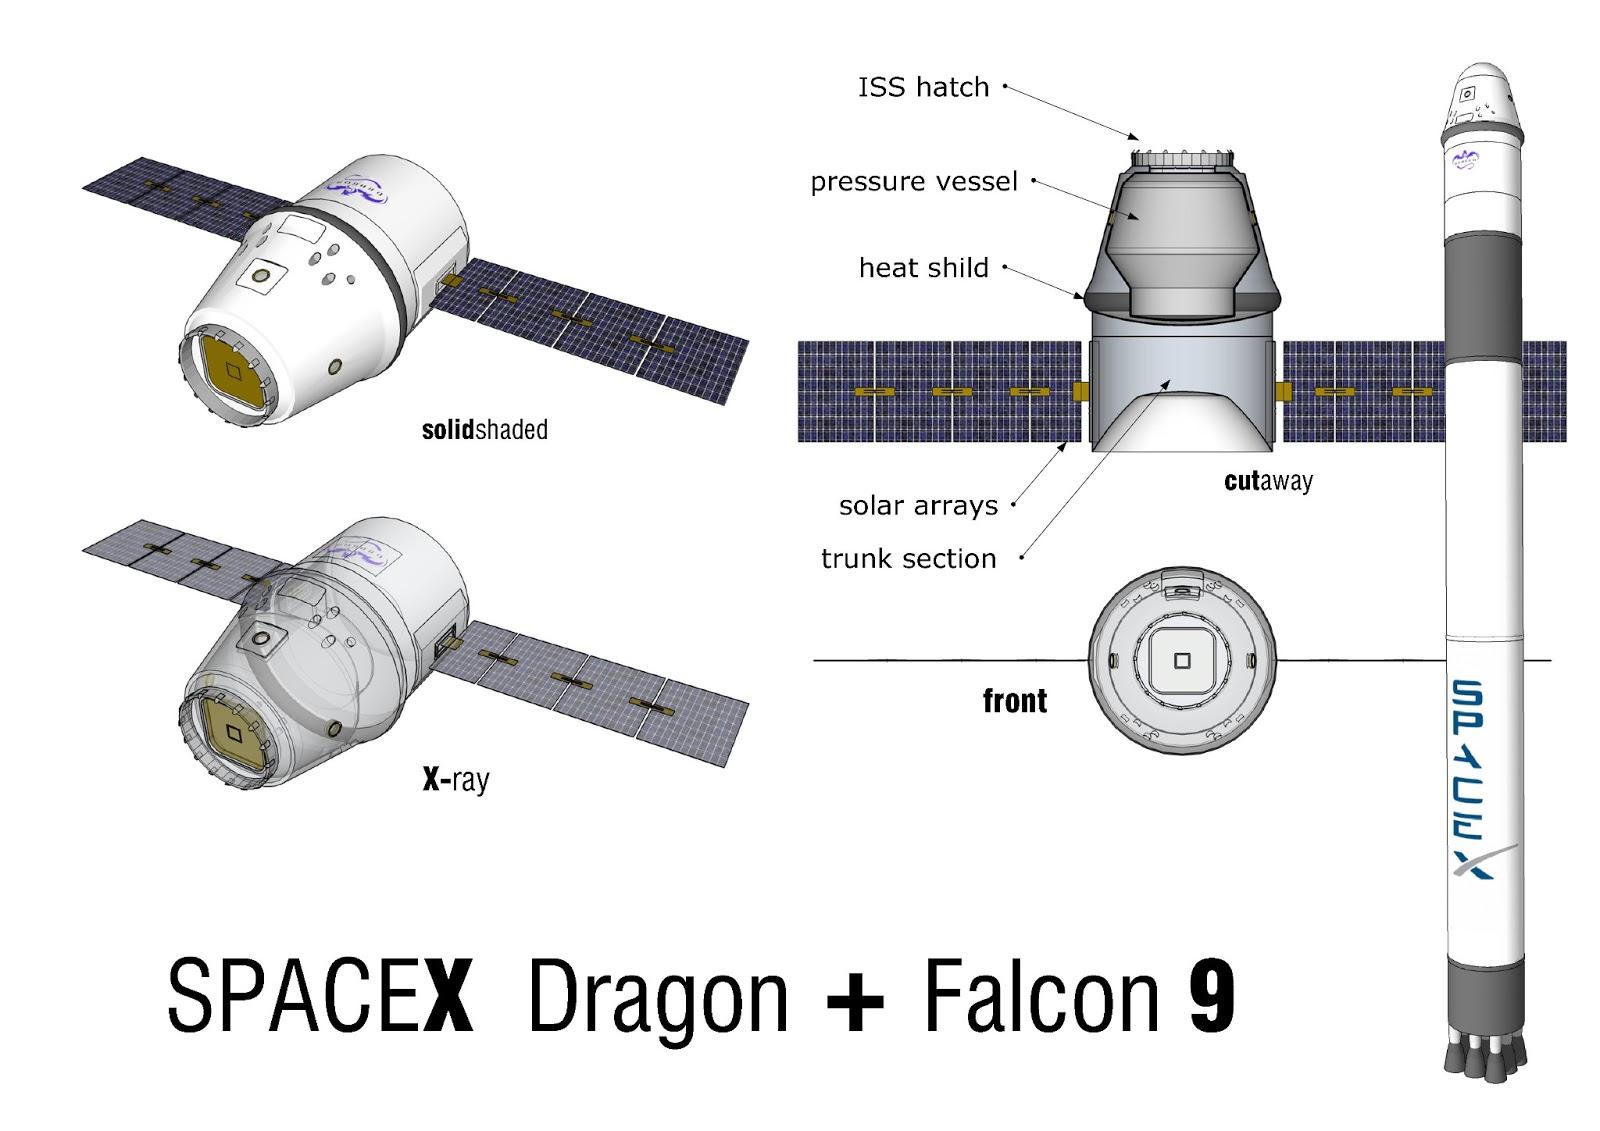 spacex dragon capsule status - photo #26